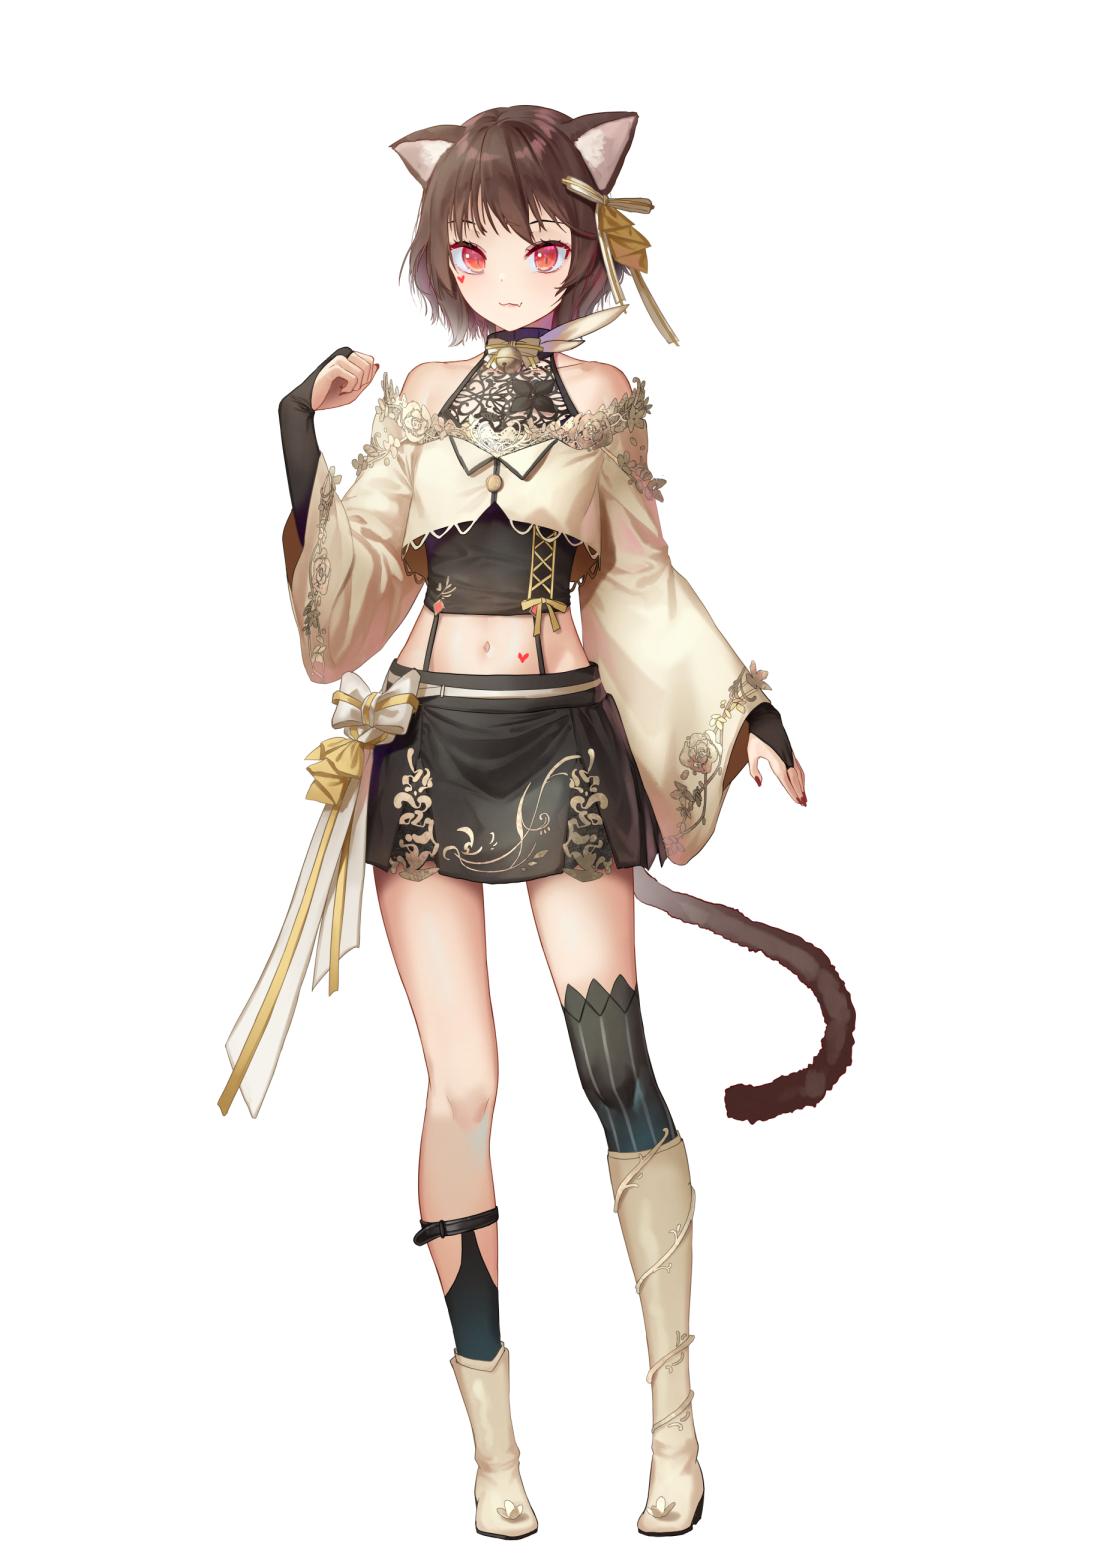 Anime Anime Girls Digital Art Artwork 2D Portrait Display Vertical Saraki Animal Ears Tail Cat Girl  1103x1560